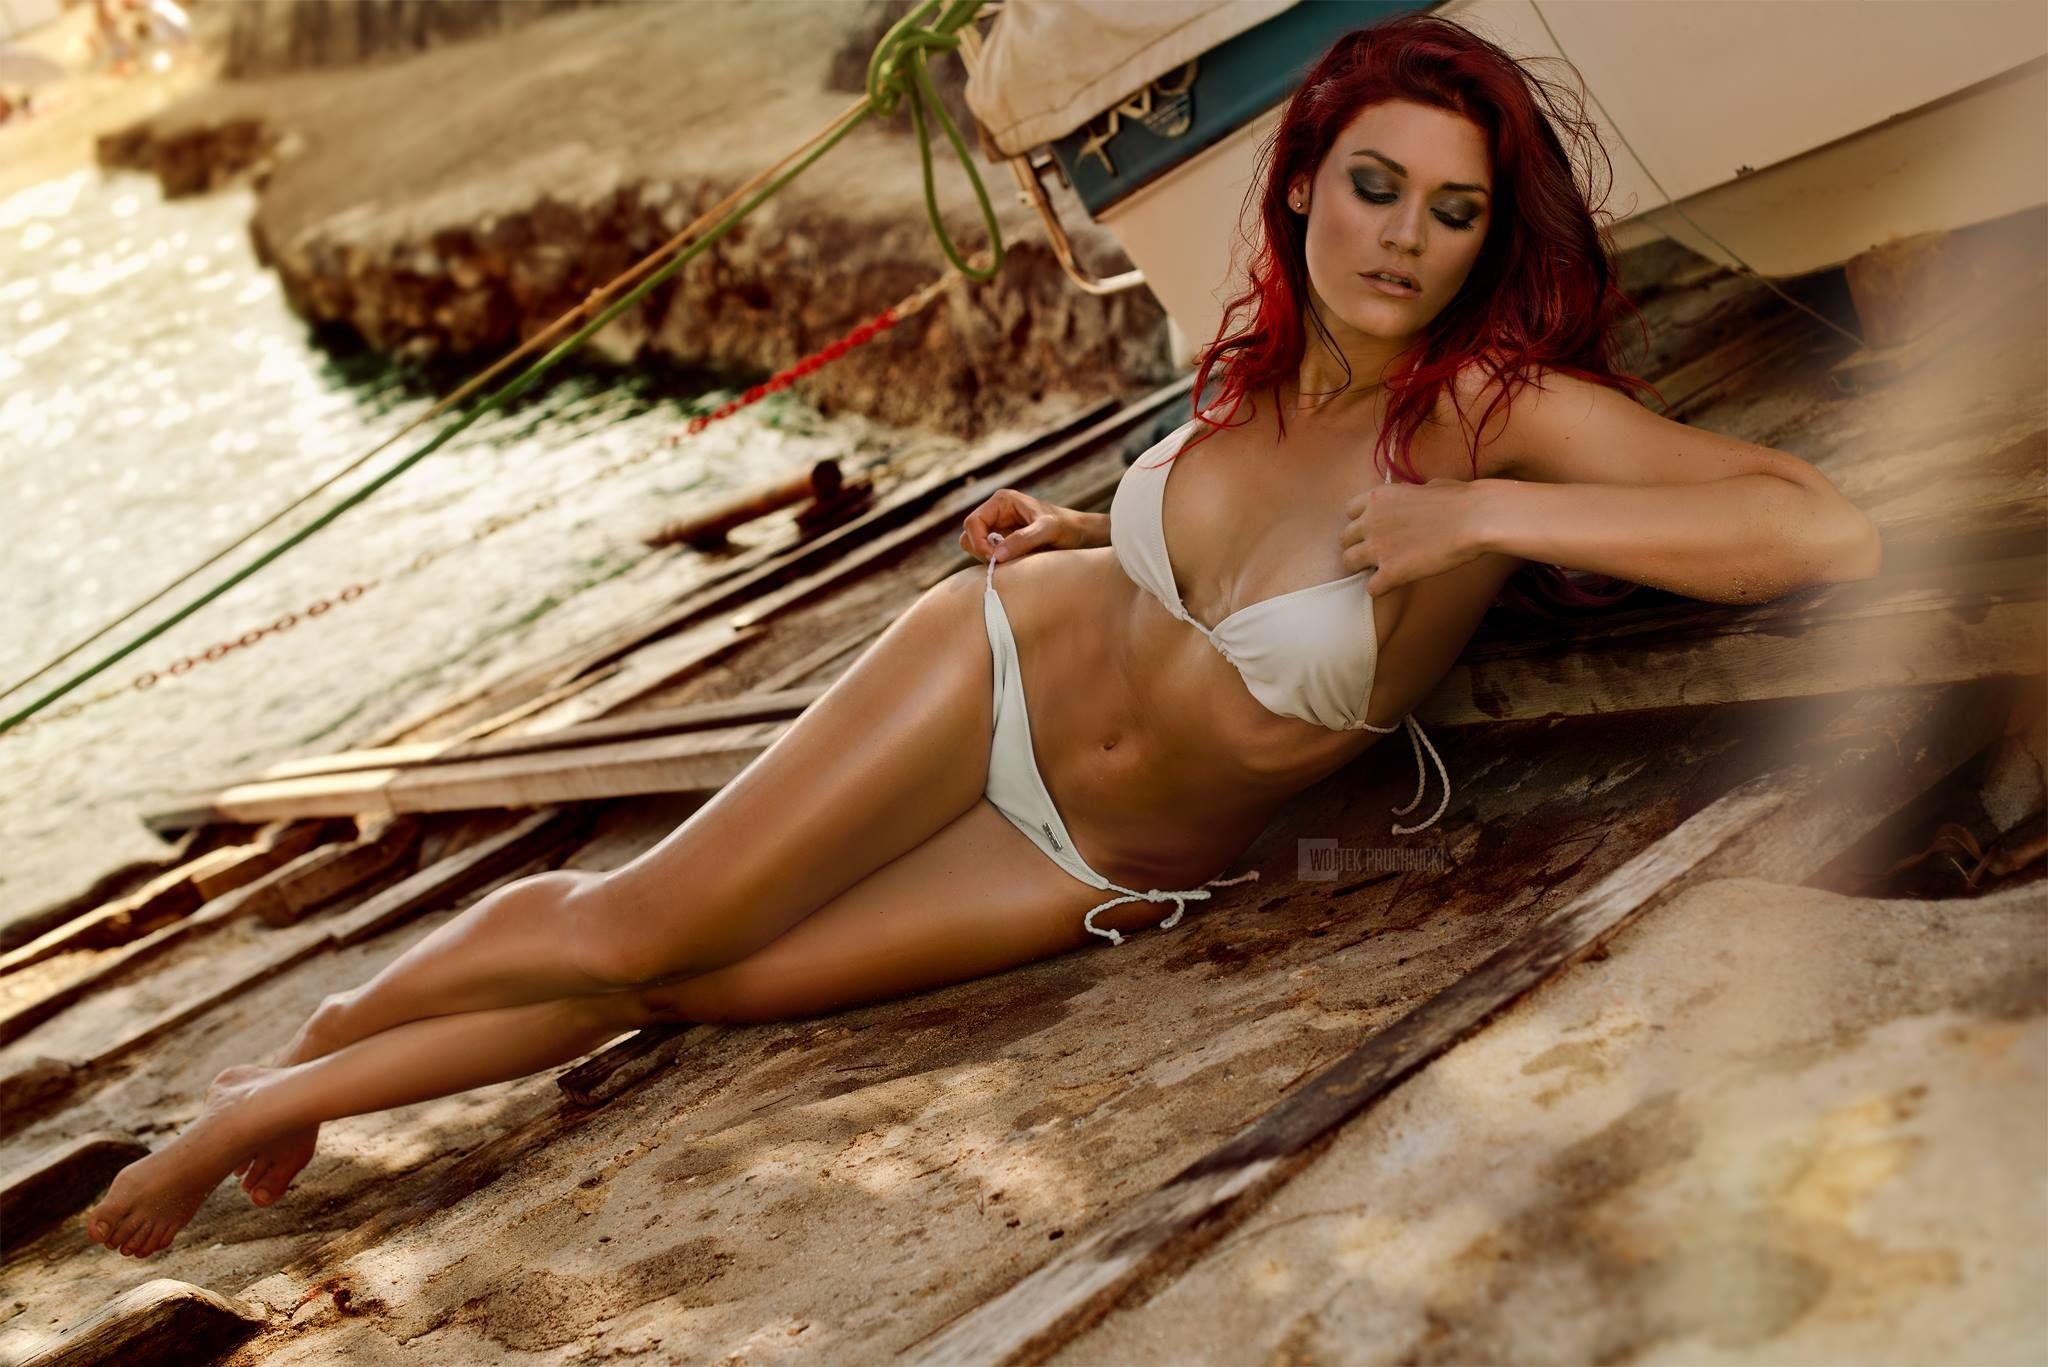 Modell: Christina Braun Photo: Woj Pruchnicki | Modell